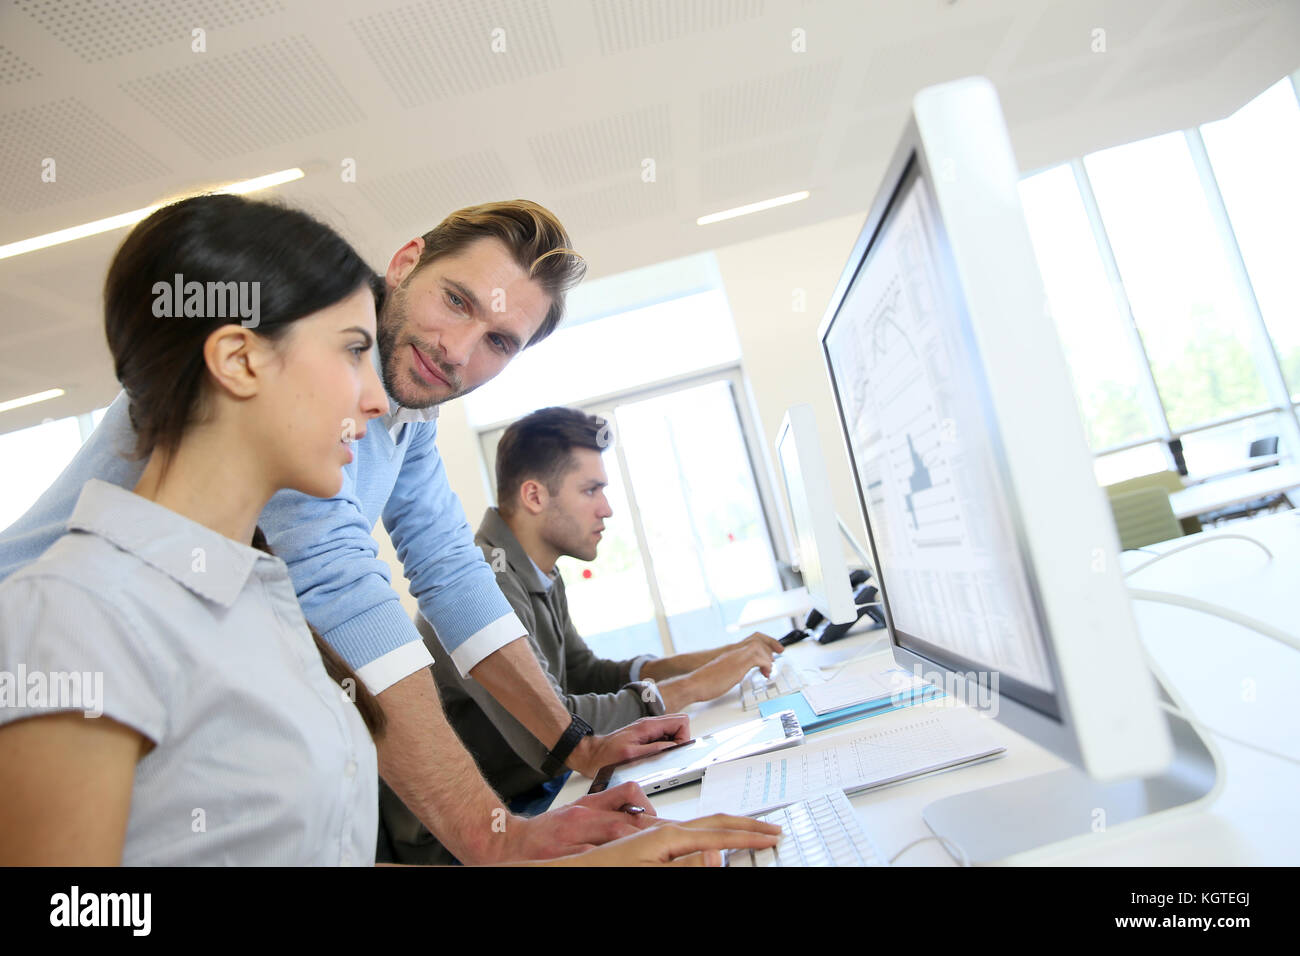 Business people working in office sur l'ordinateur de bureau Photo Stock